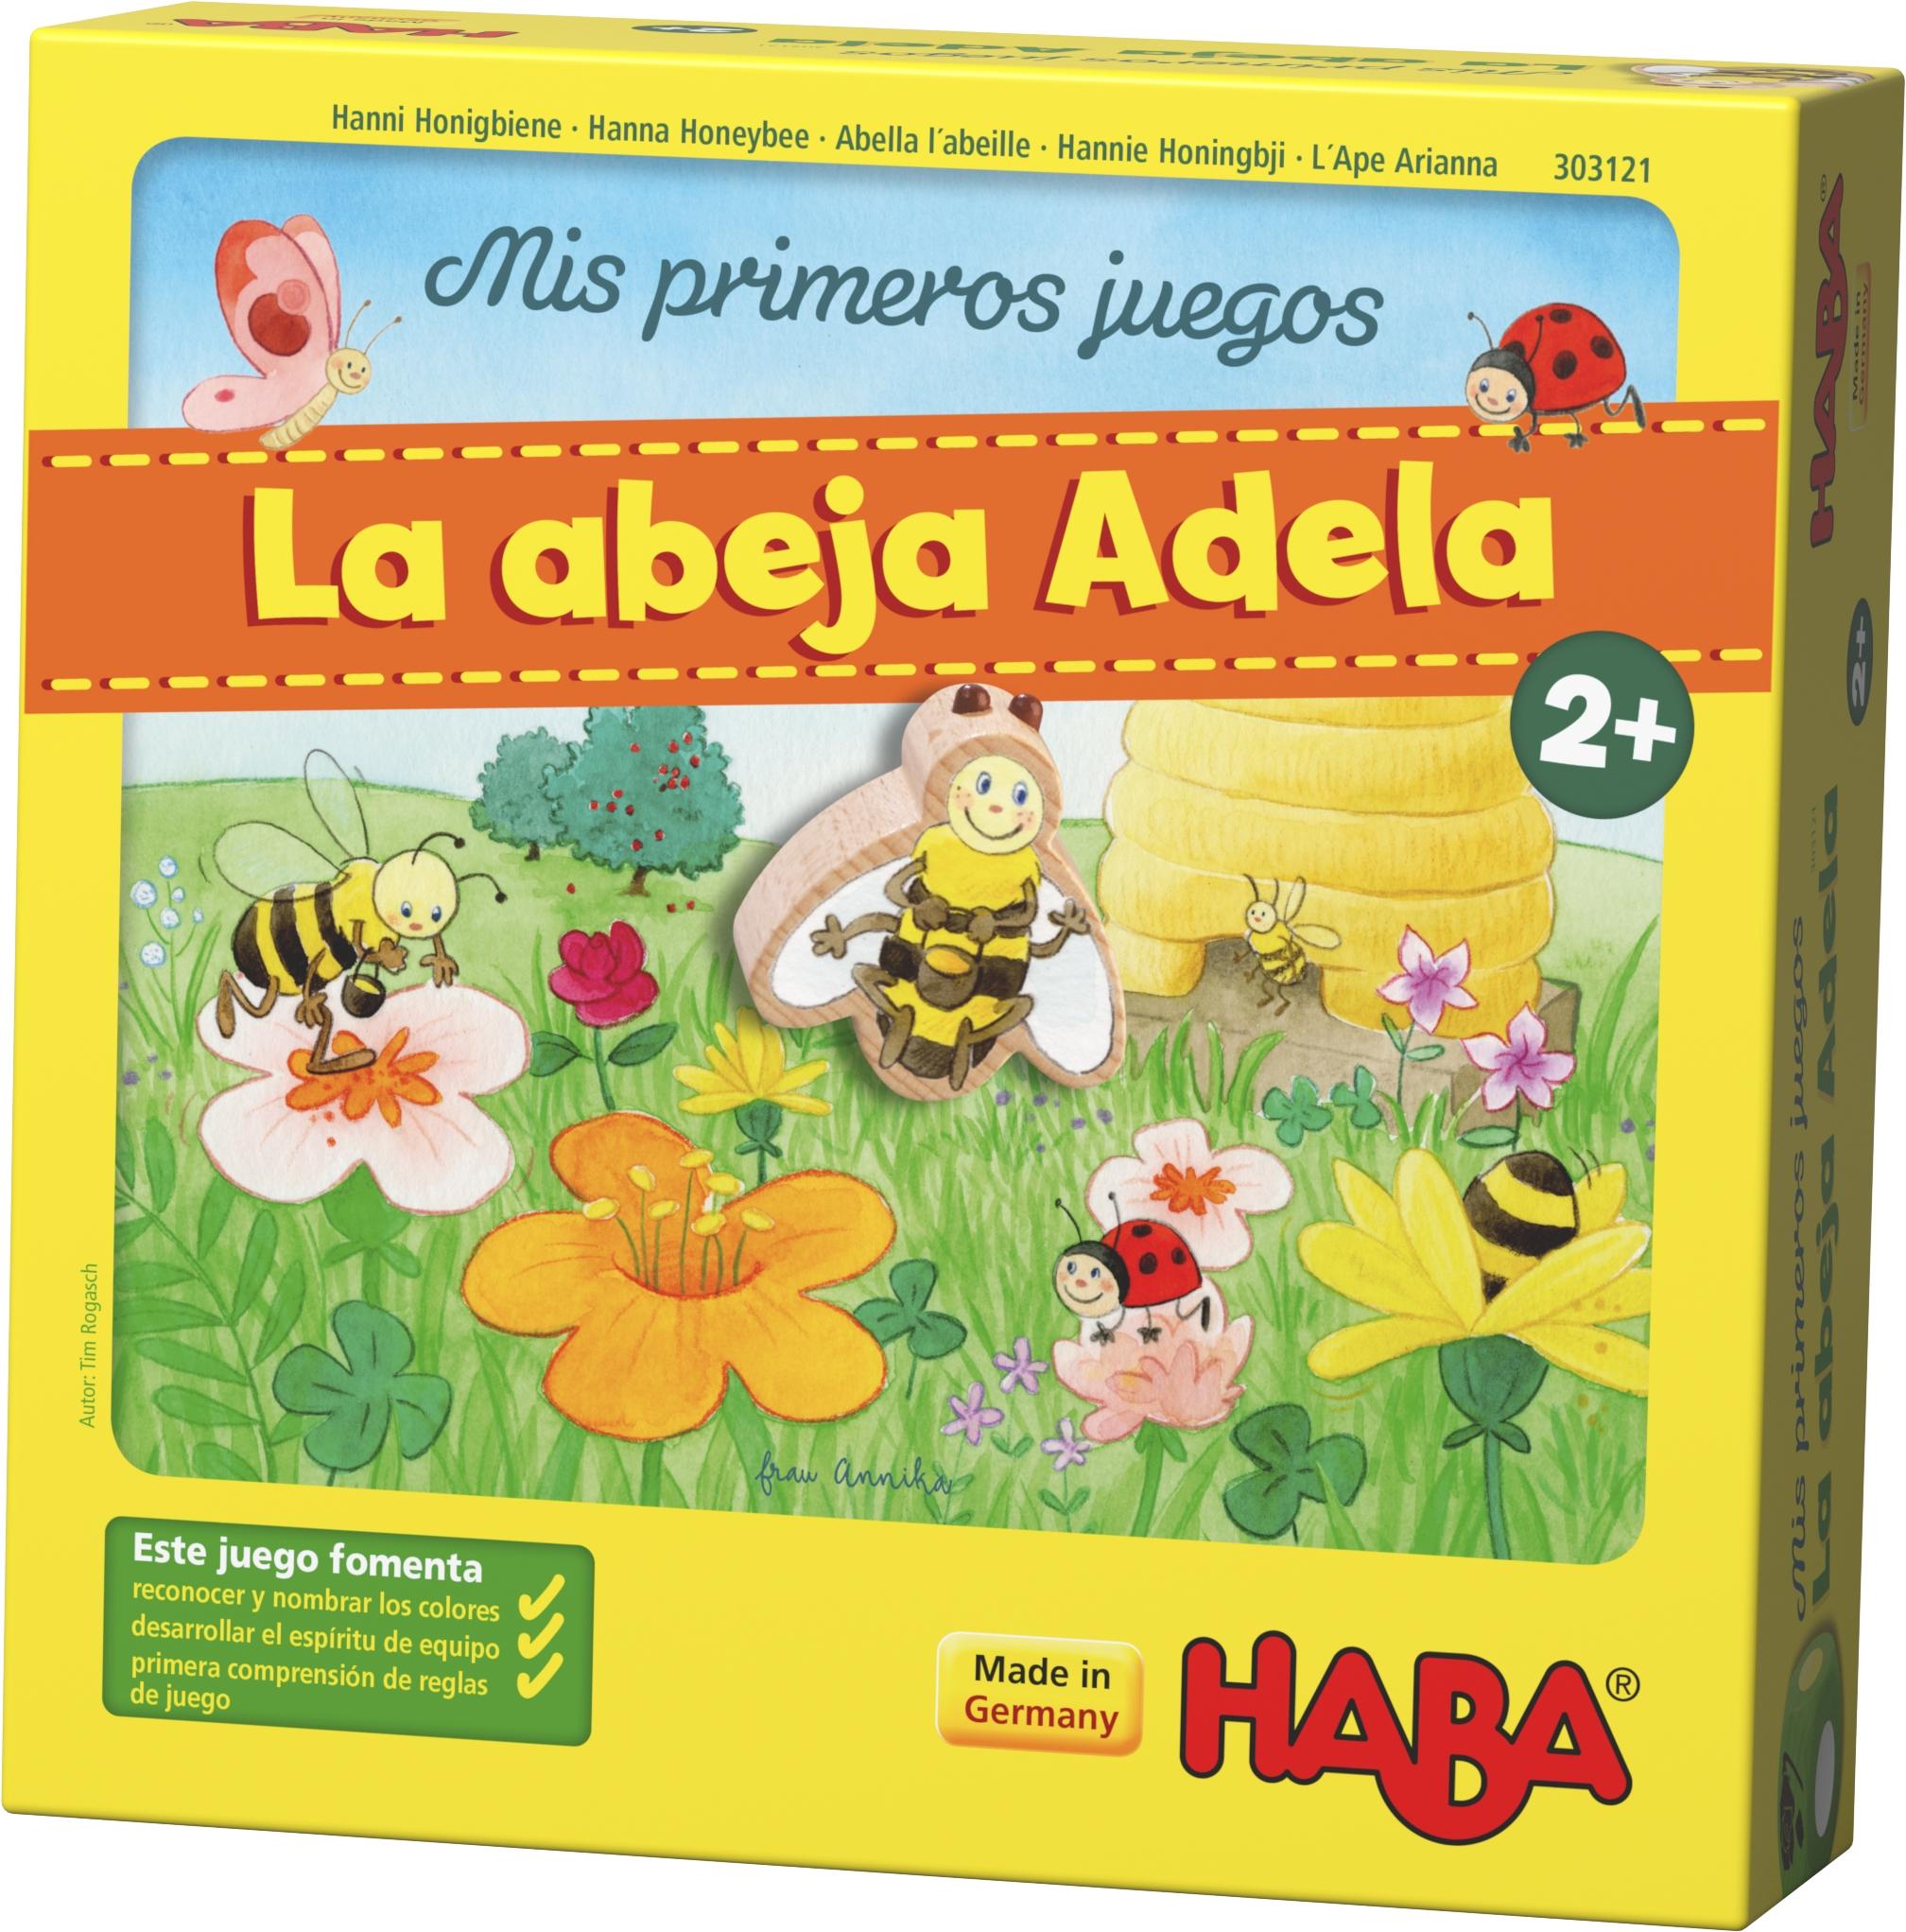 La Abeja Adela_caja ESP.jpg